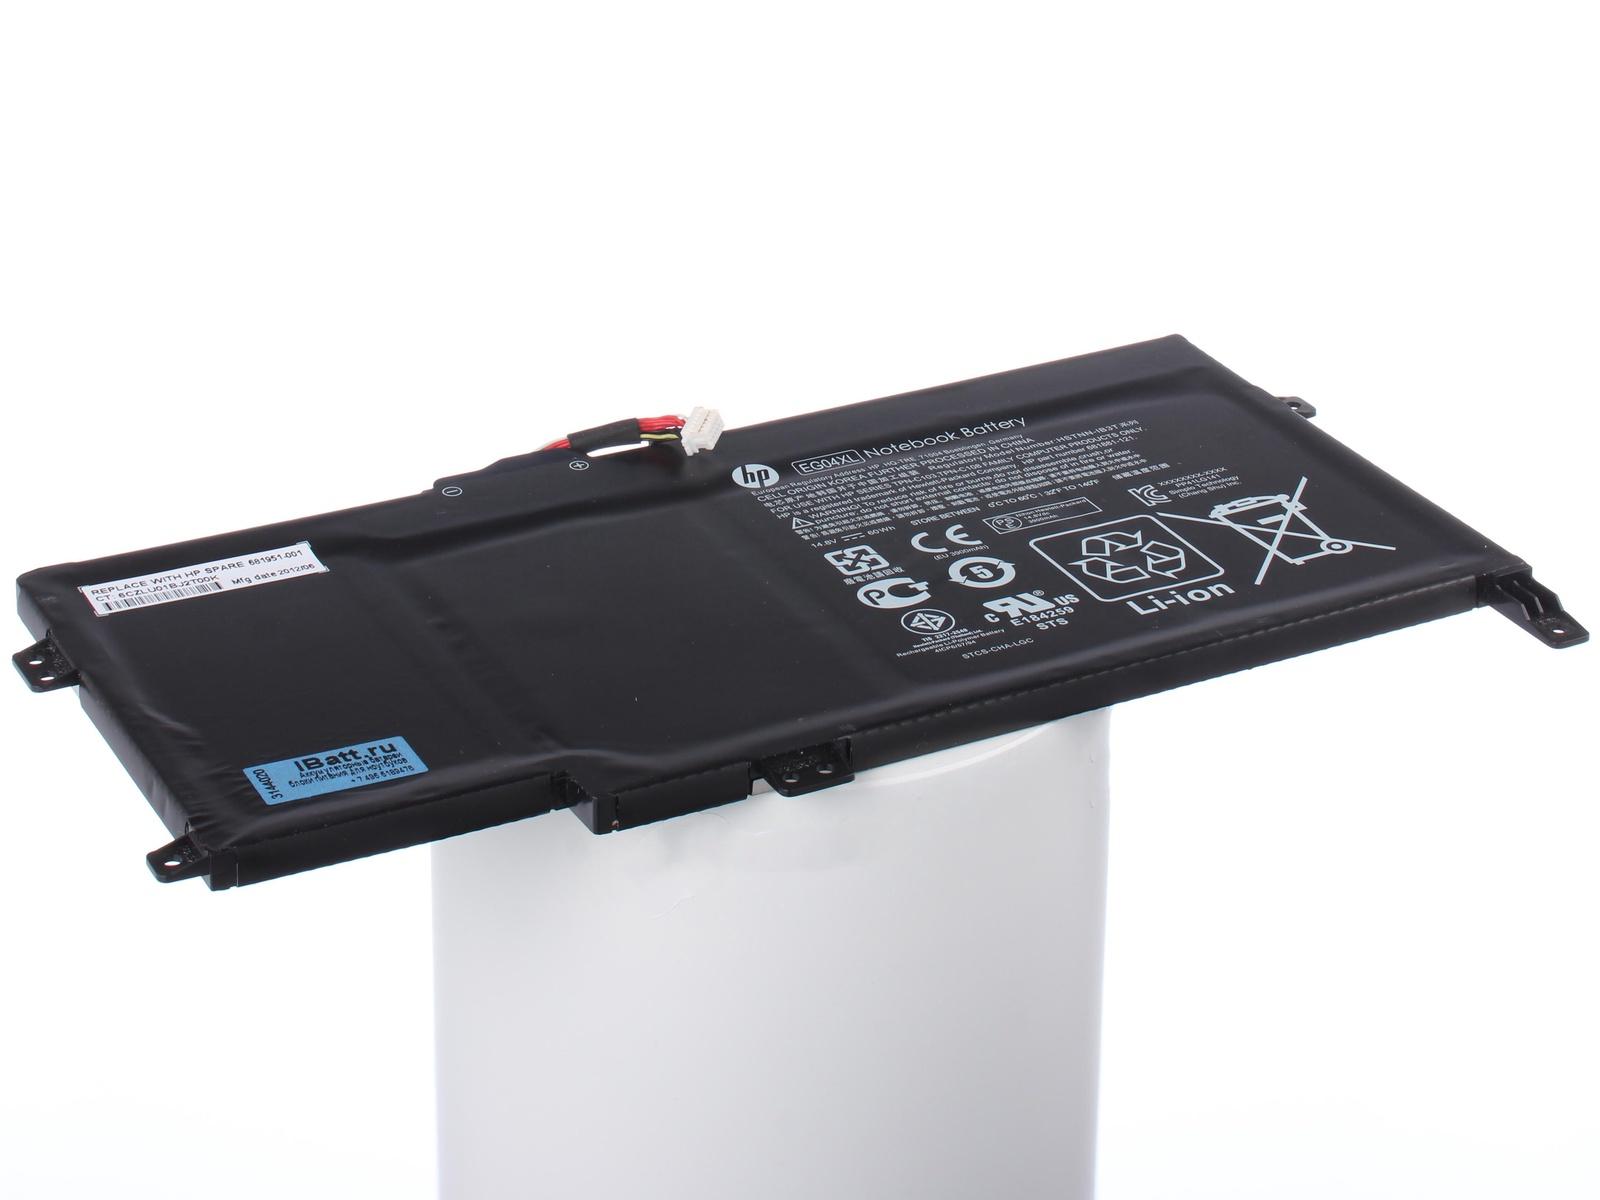 Аккумулятор для ноутбука iBatt для HP-Compaq Envy 6-1031er, Envy 6-1150er, Envy 6-1254er, Envy 6-1101er, Envy 6-1154er, ENVY Sleekbook 6-1031er, Envy 6-1251er, Envy 6-1053er, Envy 6-1000, Envy 6-1252er, Envy 6-1253er цена